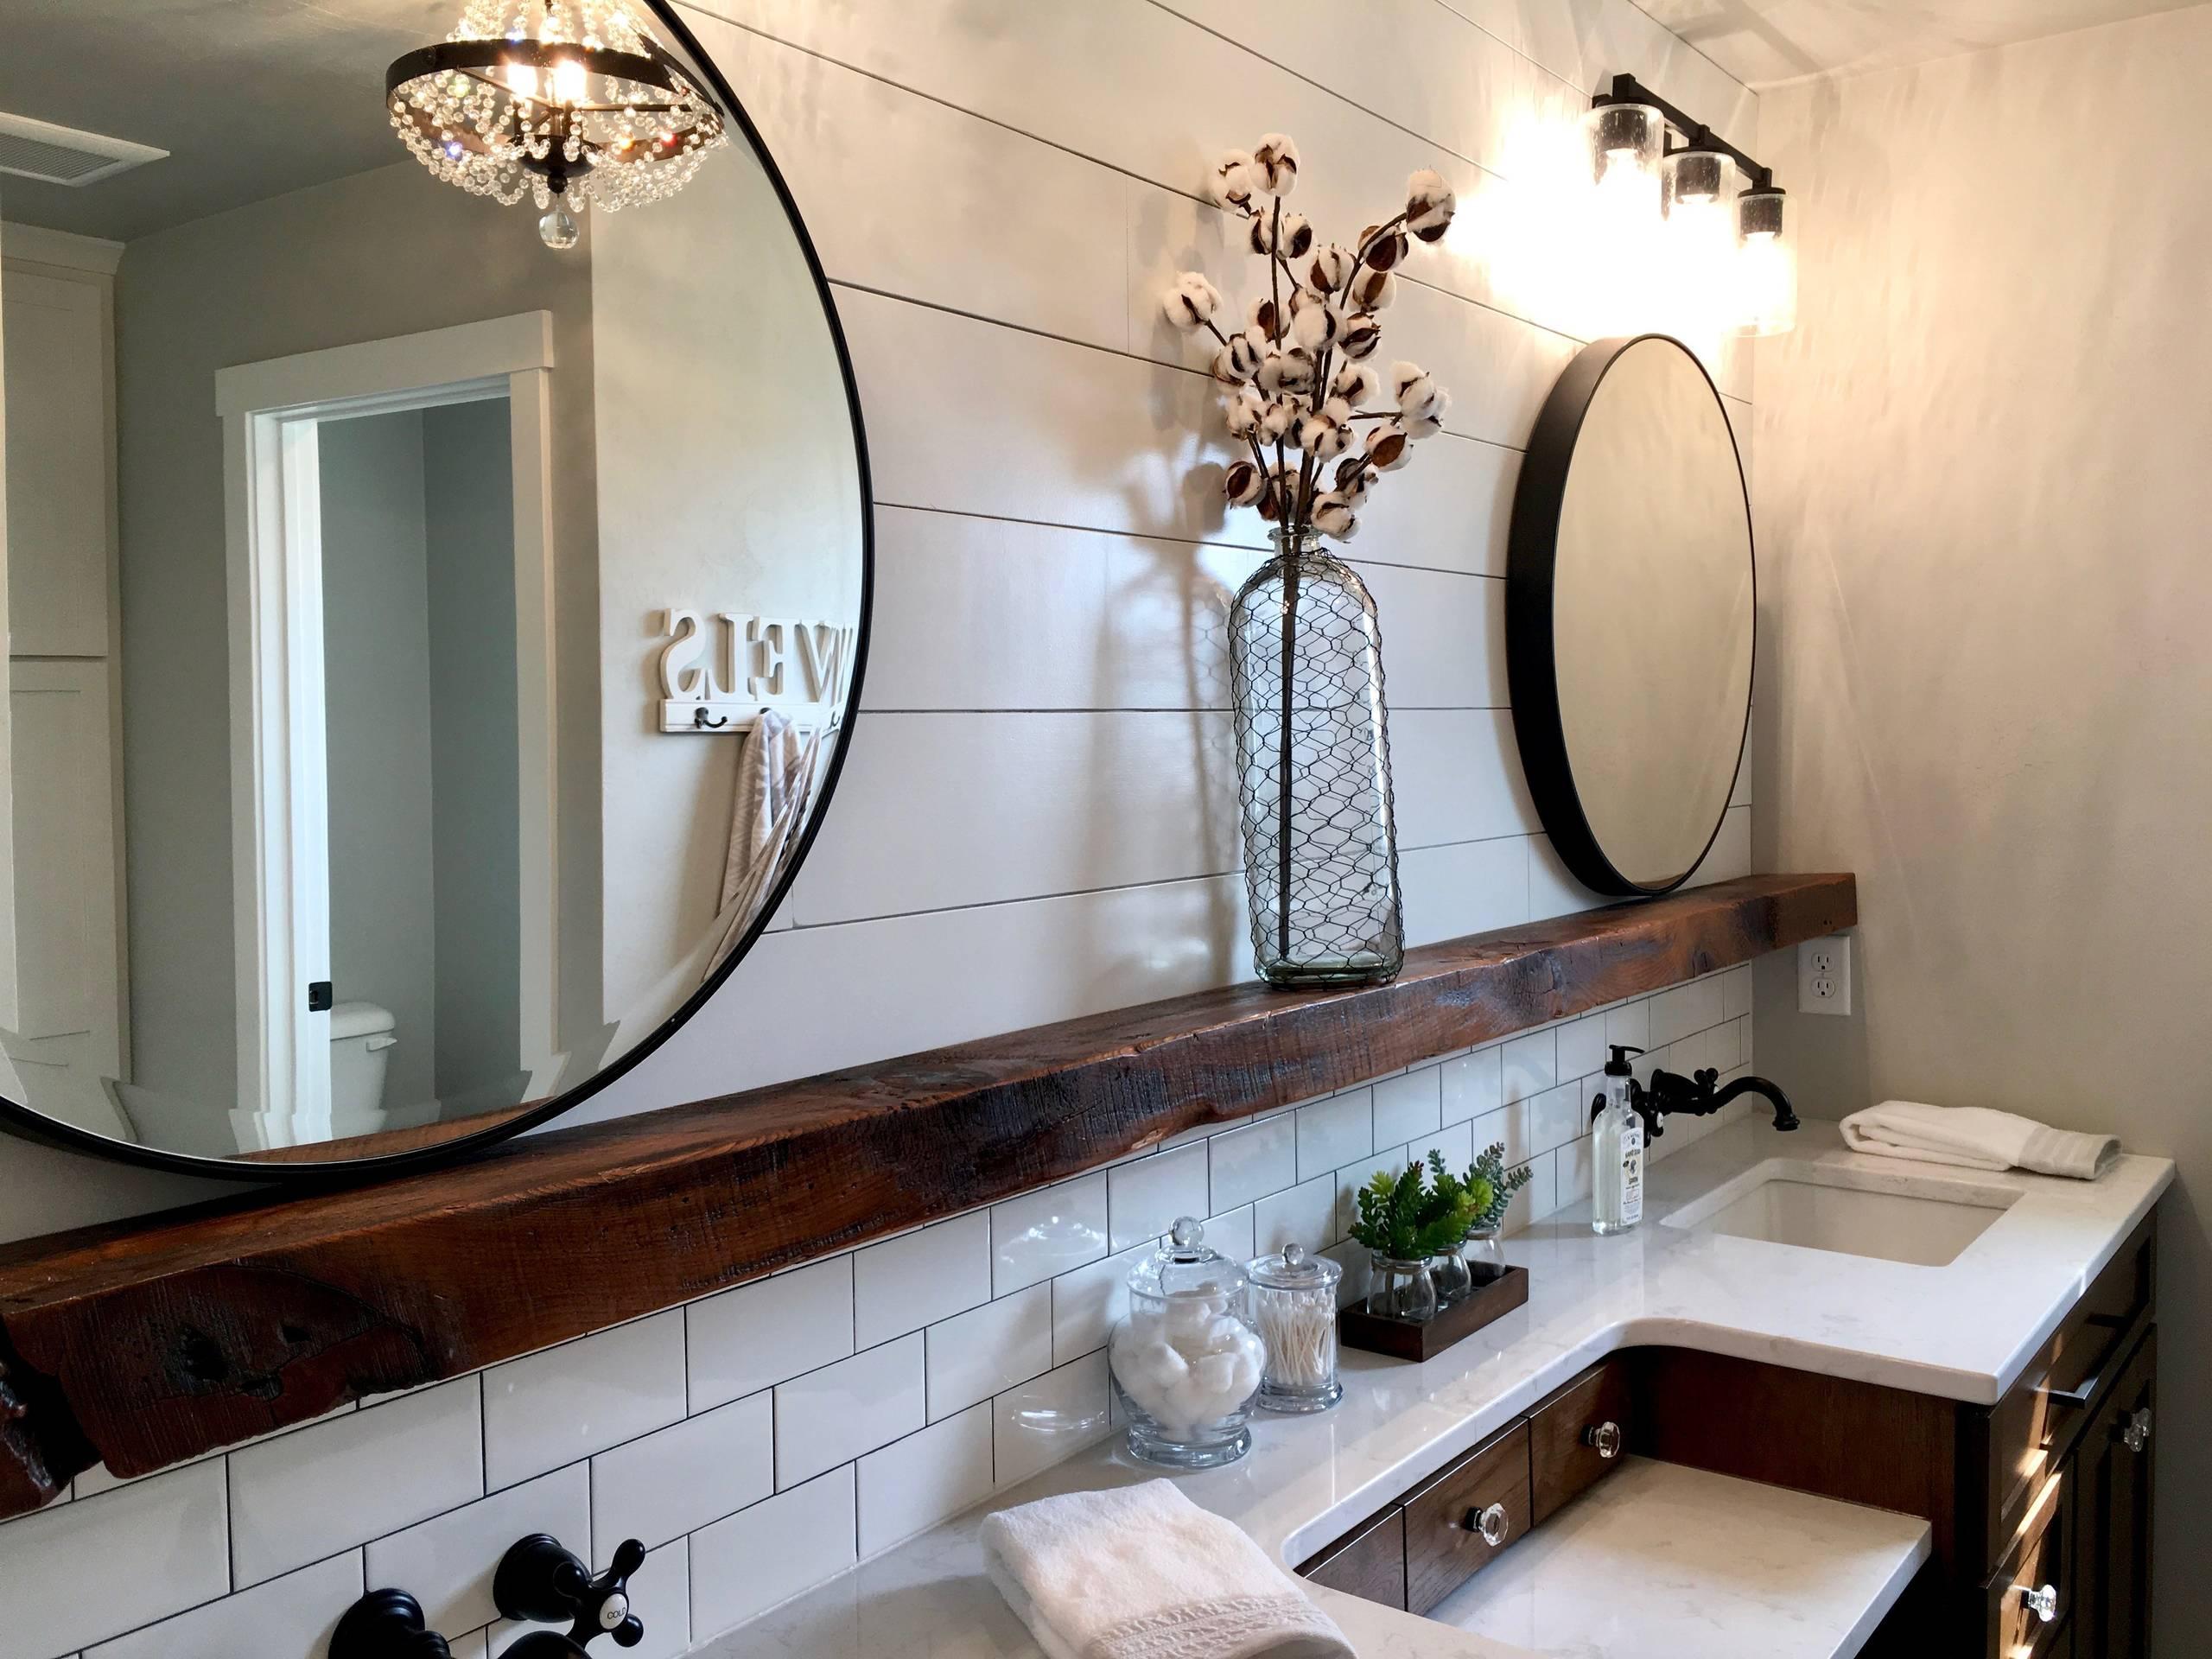 75 Beautiful Farmhouse Bathroom Ideas Pictures Houzz